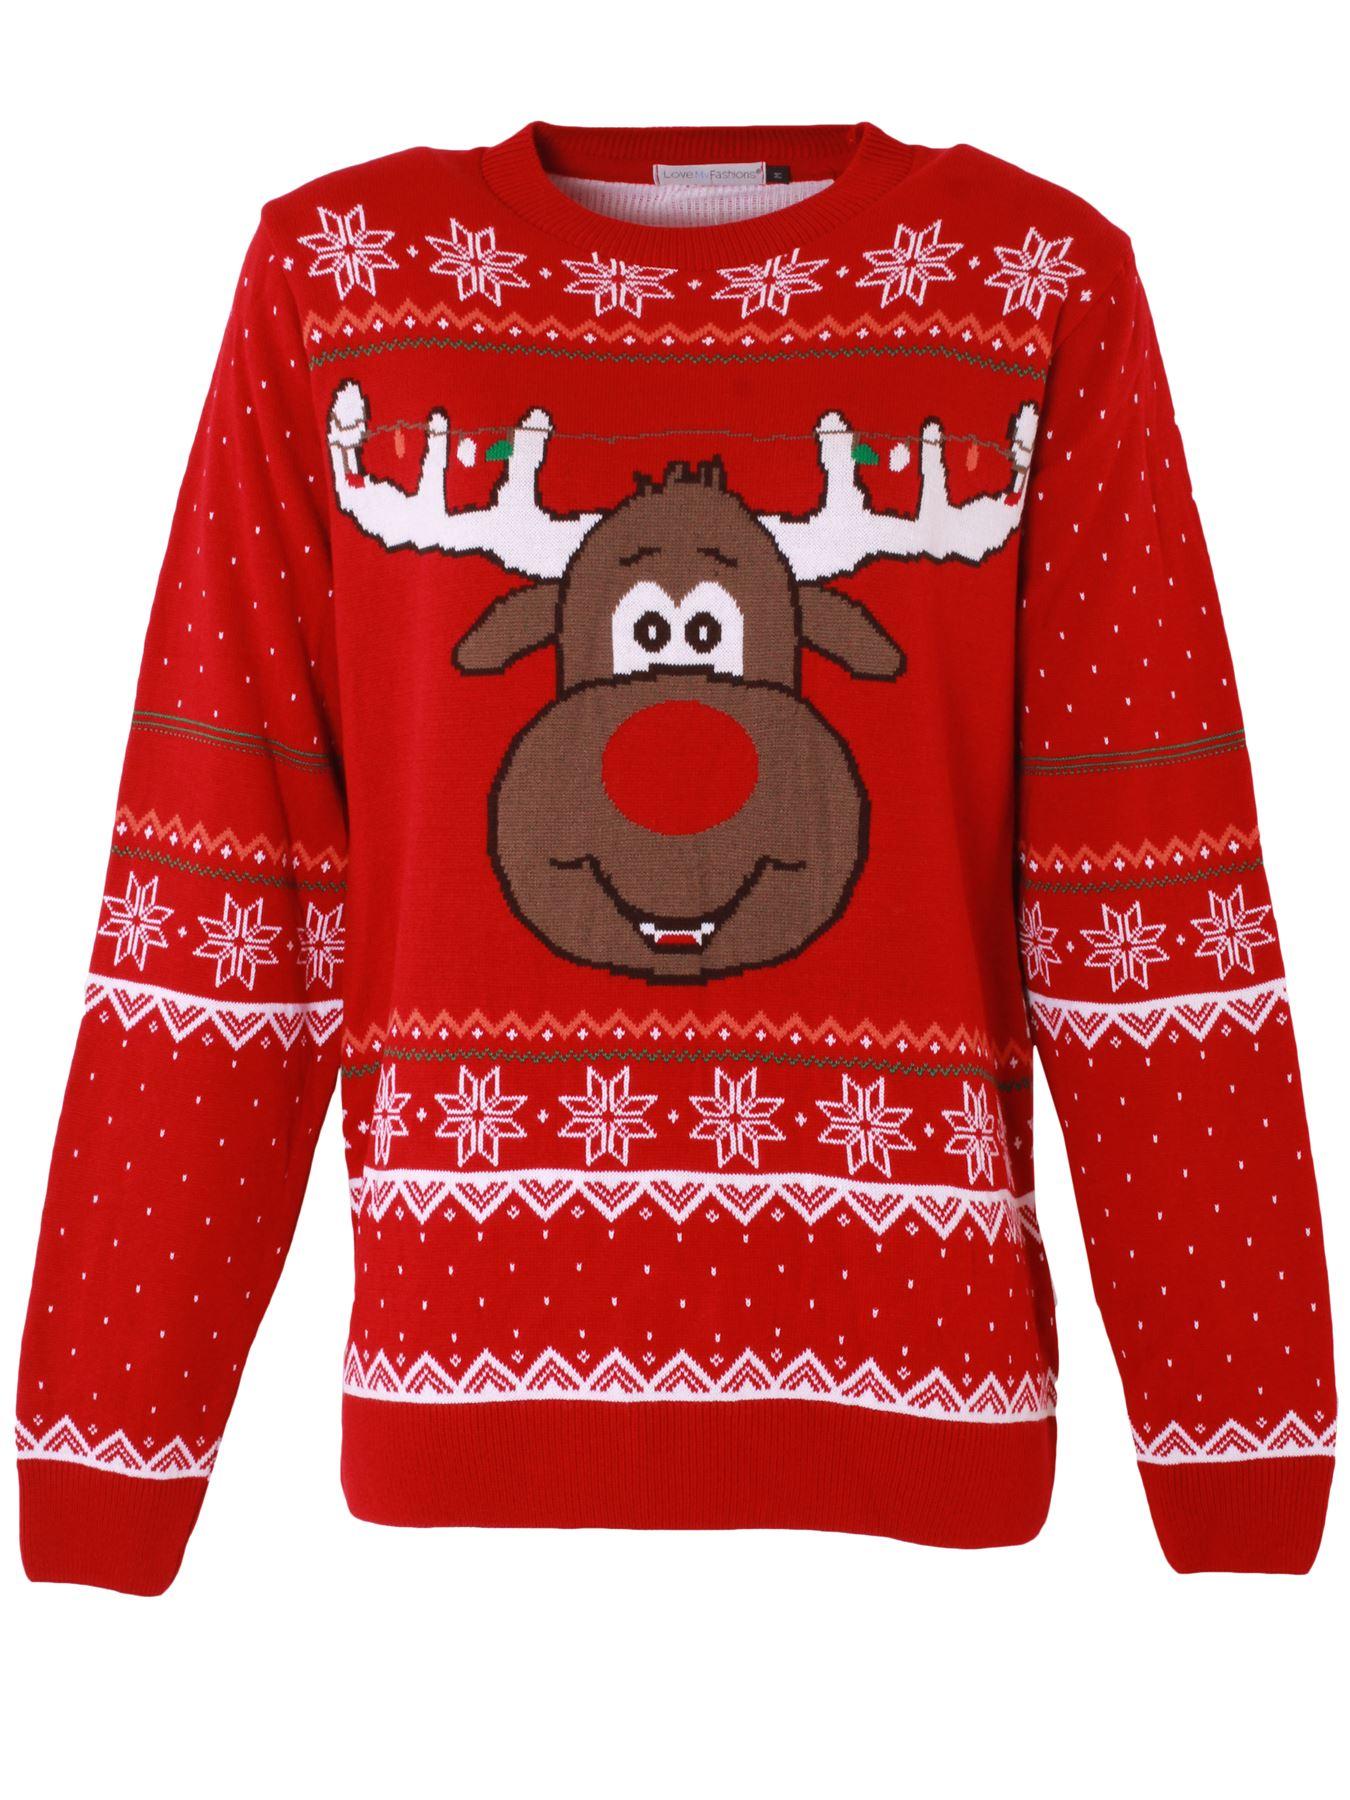 Unisex-Christmas-Jumper-Girls-Boys-Reindeer-Snow-Flake-Knitted-Pullover-Sweater thumbnail 6